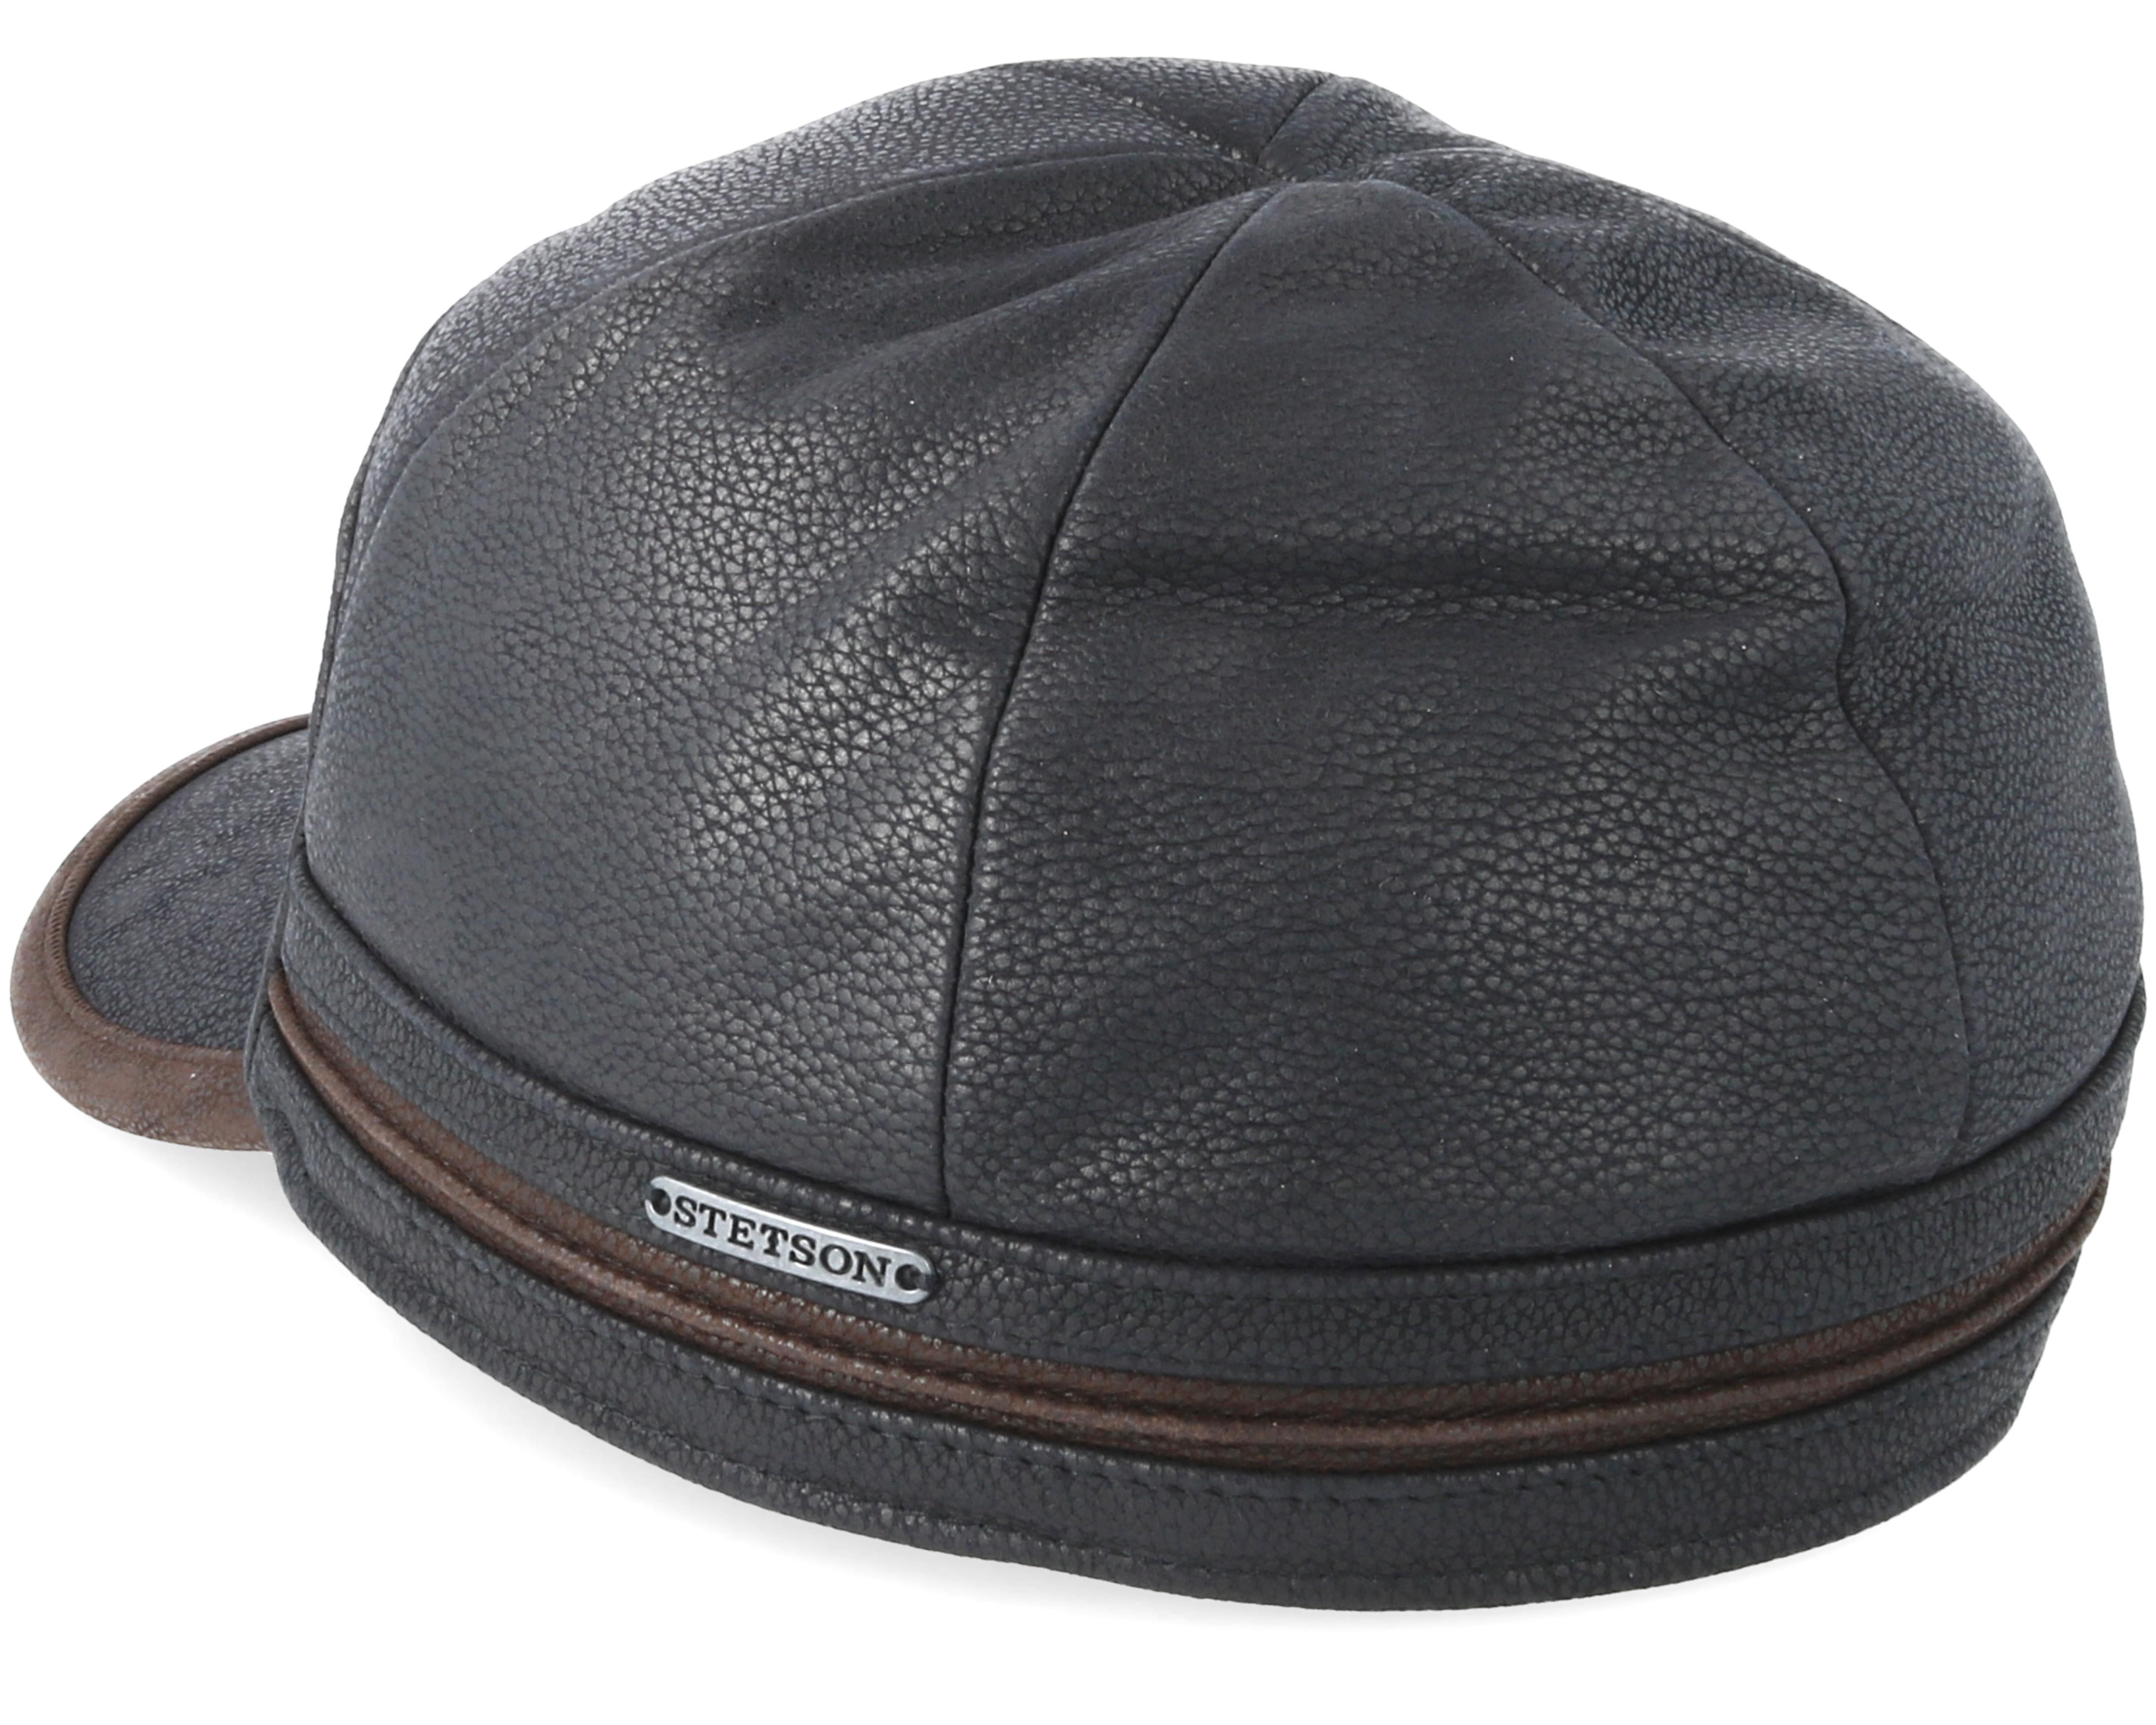 Cowhide Baseball Cap Stetson Caps Hatstoreworld Com